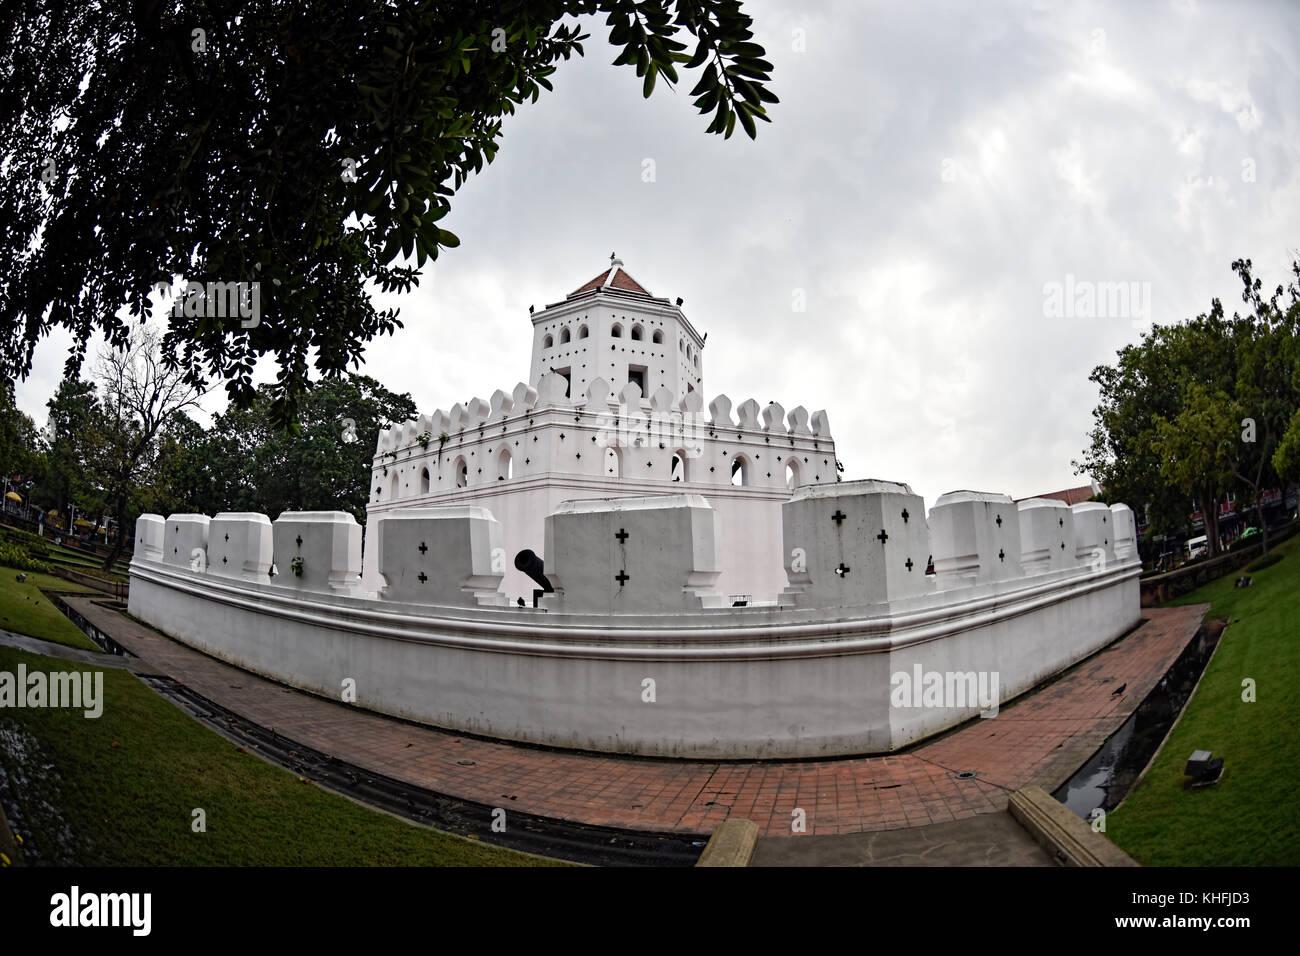 Fort at Phra Arthit, Bangkok, Thailand - Stock Image